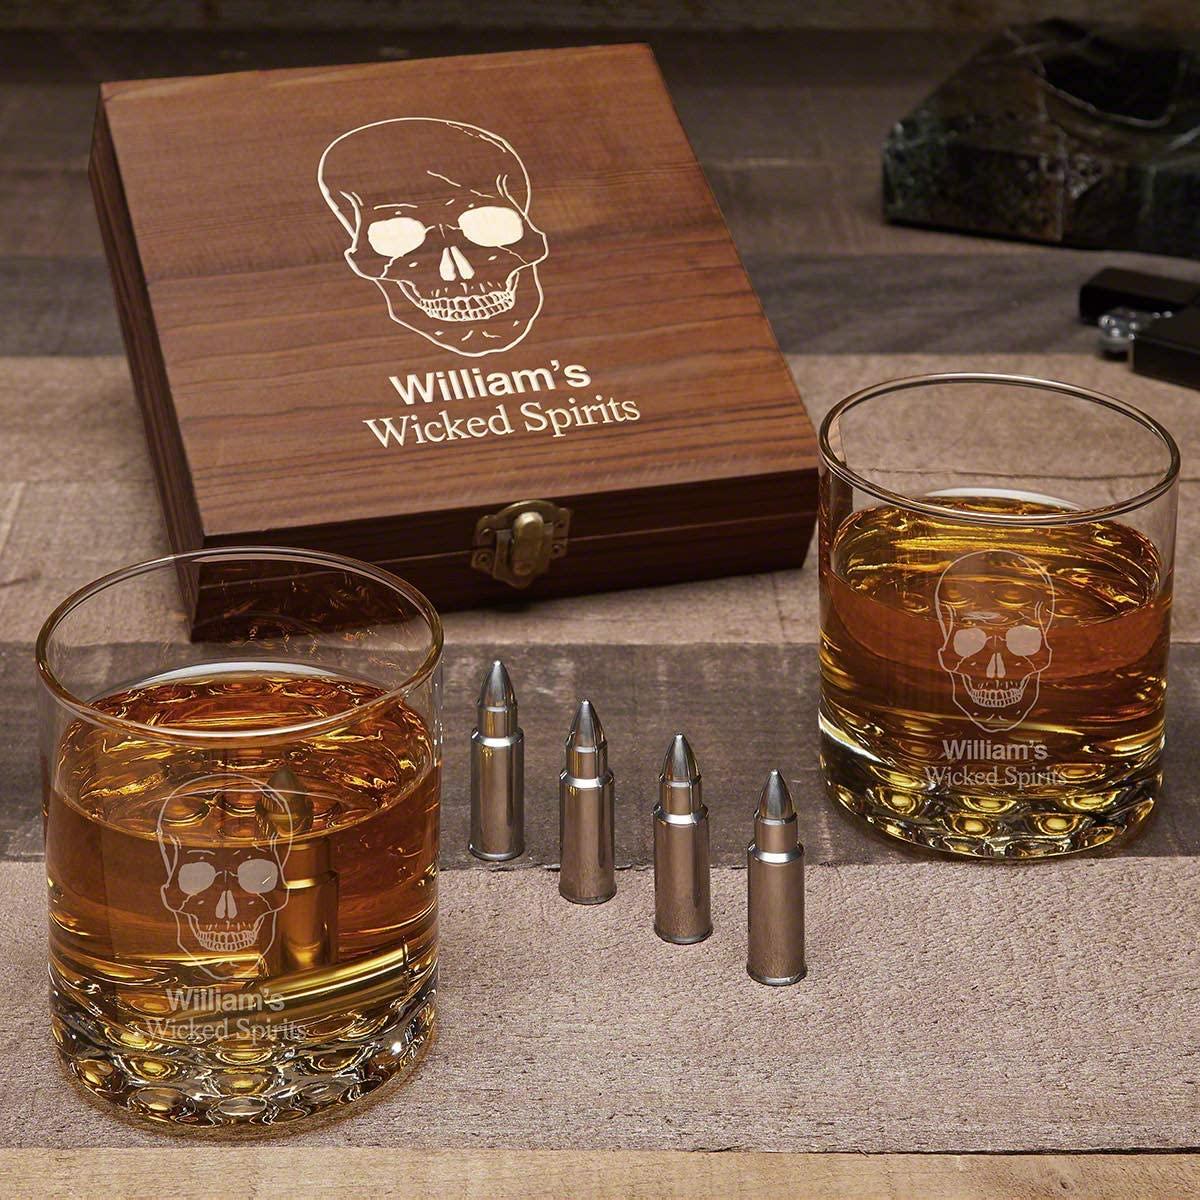 Phantom Skull Personalized Buckman Whiskey Glasses Set with Bullet Whisky Stones (Custom Product)